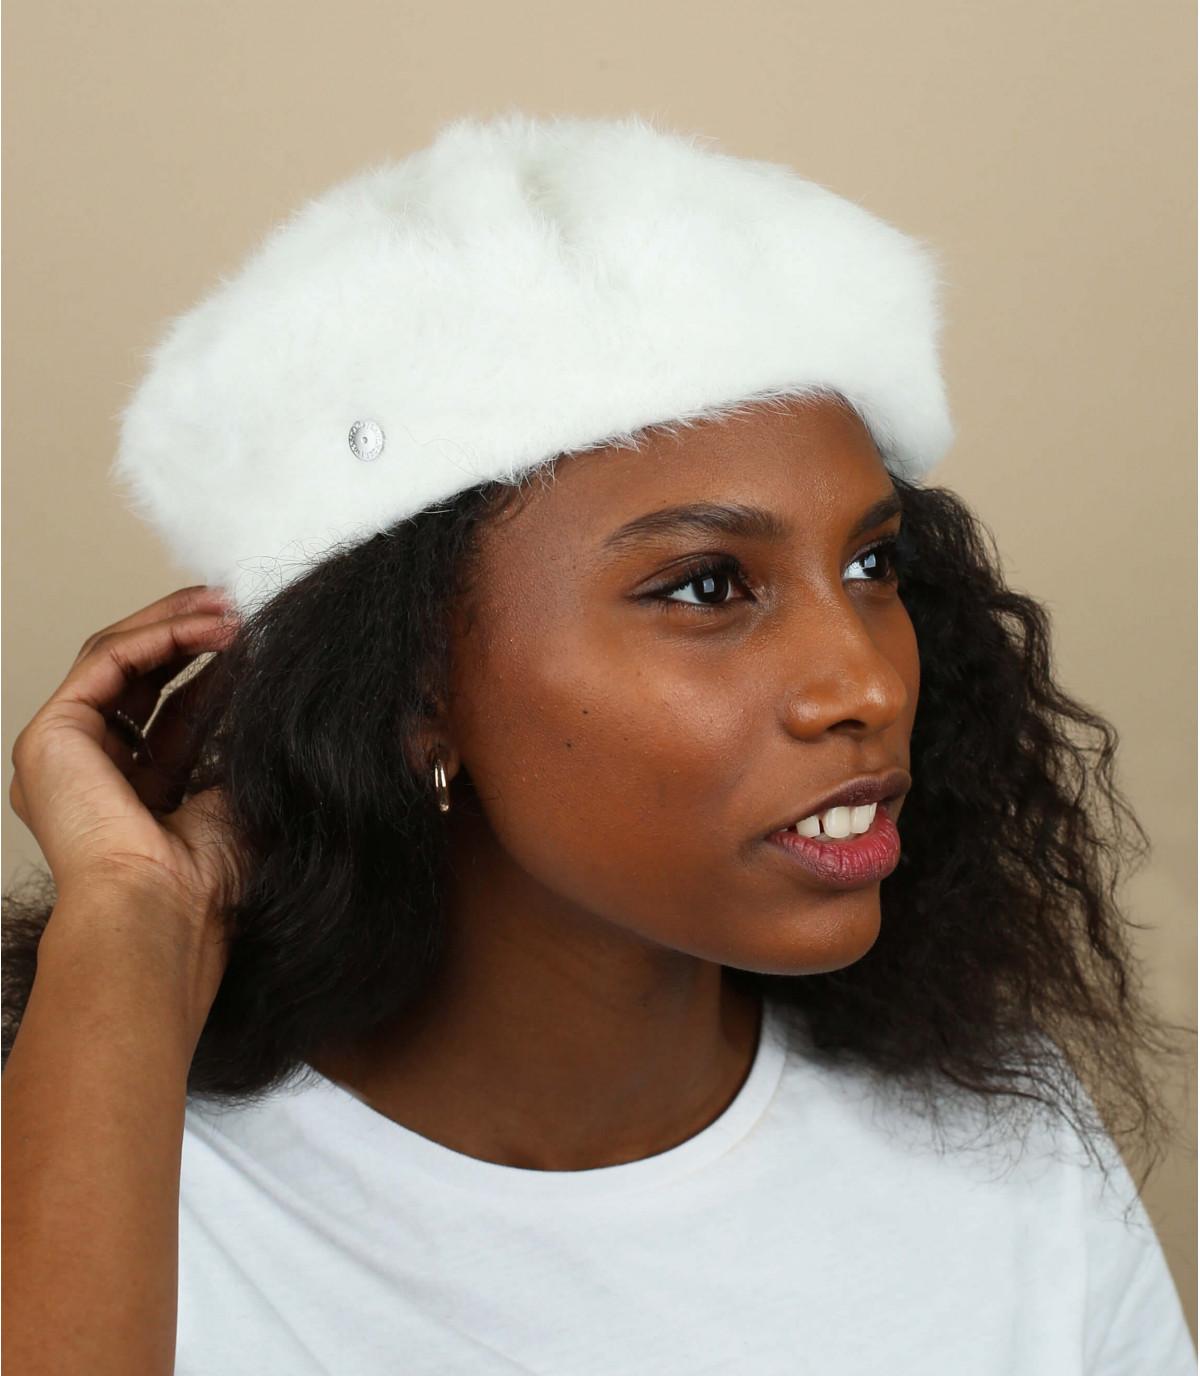 angora bianco berretto Laulhère